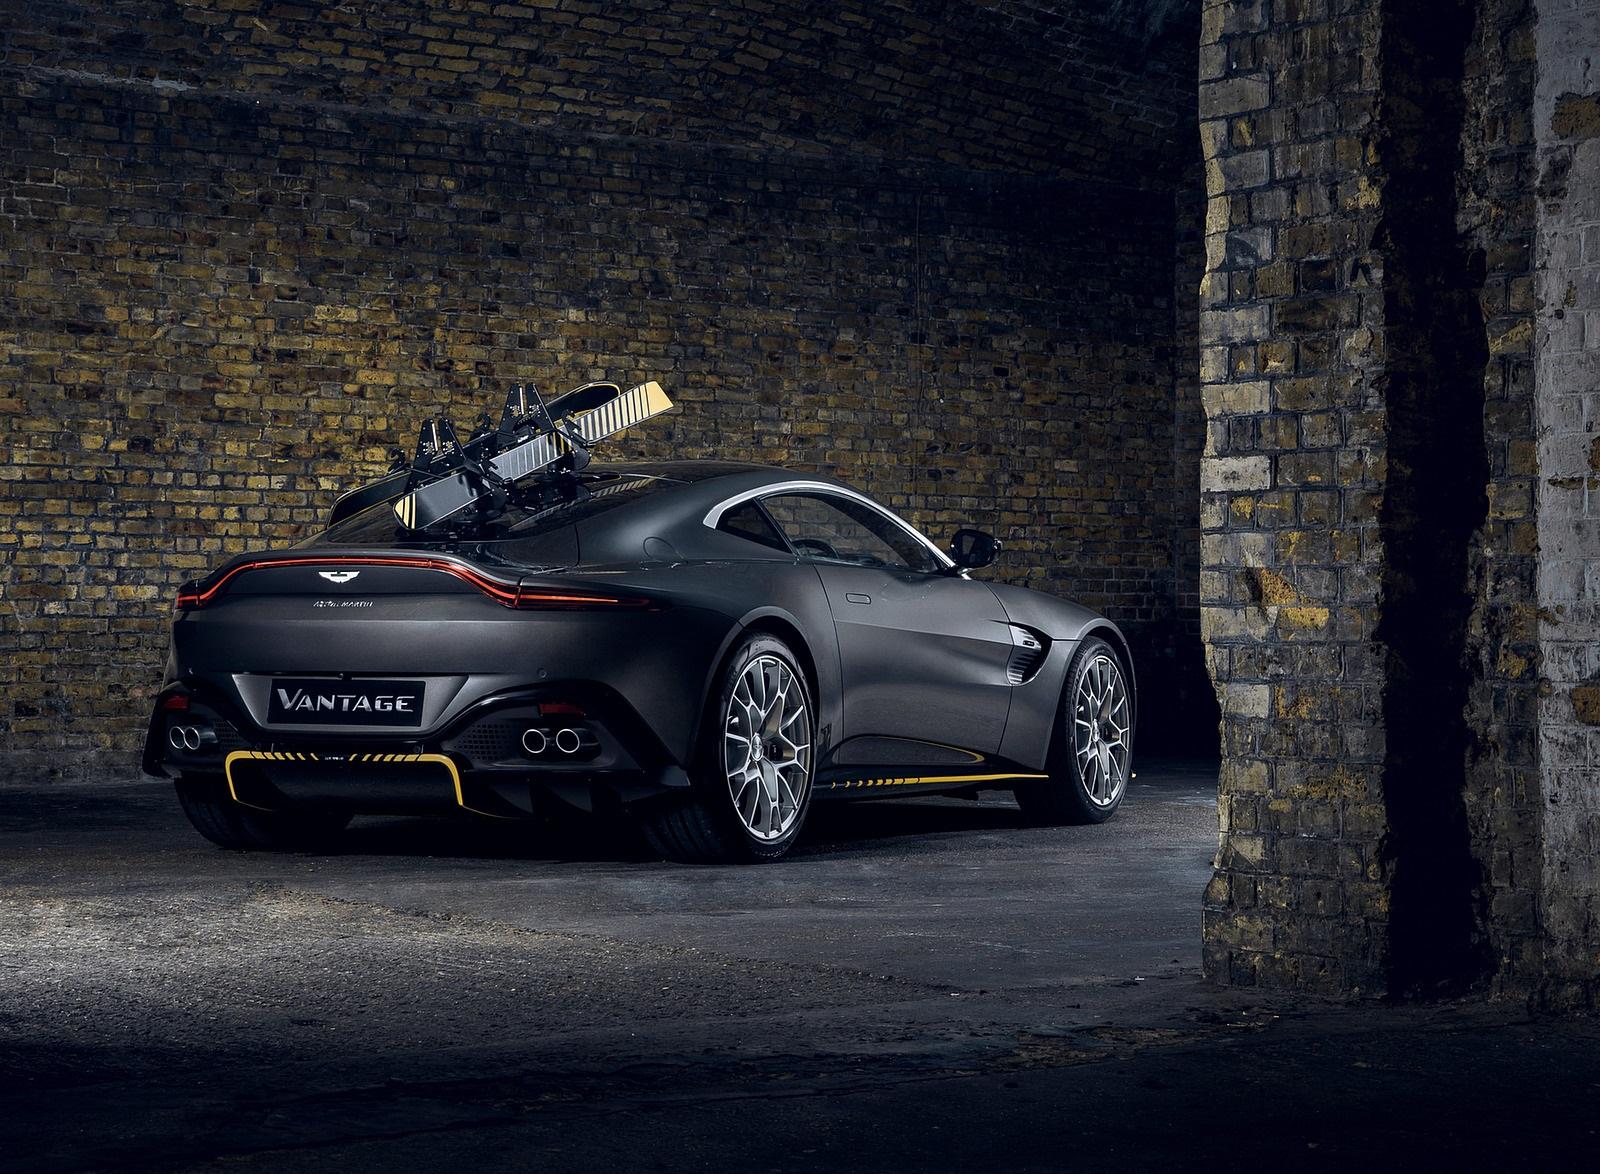 2021 Aston Martin Vantage 007 Edition Rear Three-Quarter Wallpapers (4)